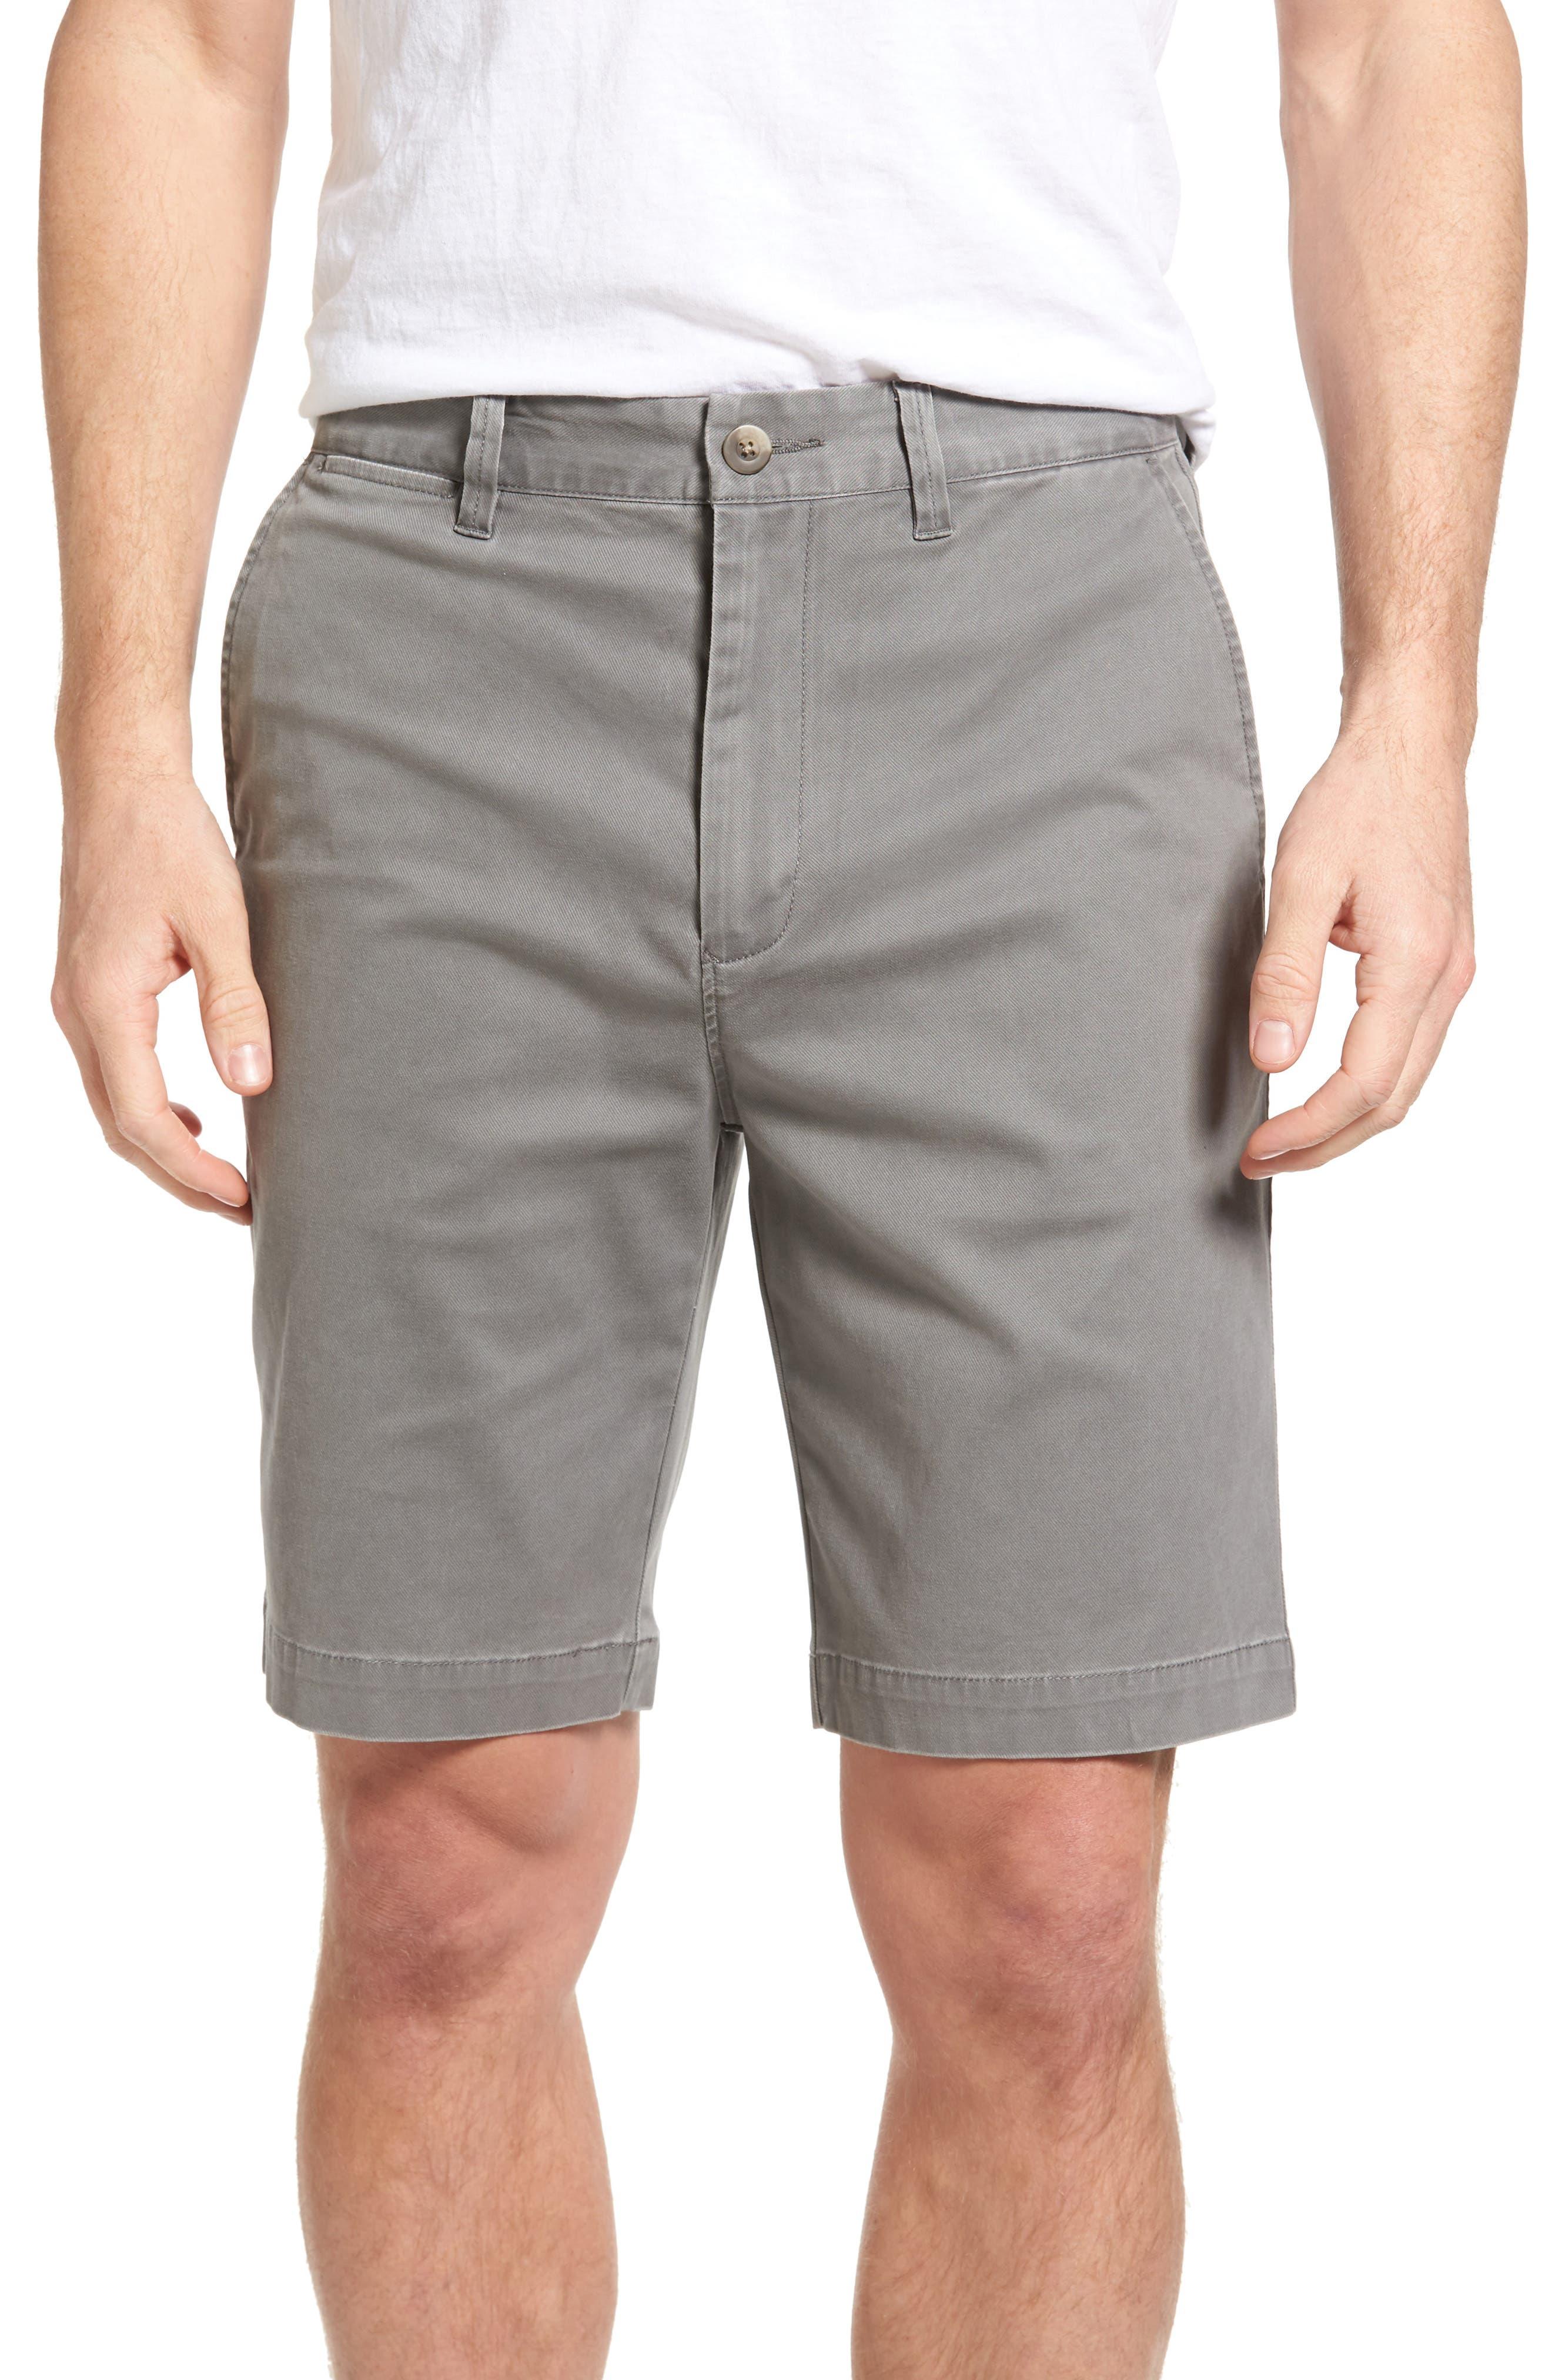 Peel Forest Chino Shorts,                             Main thumbnail 1, color,                             050